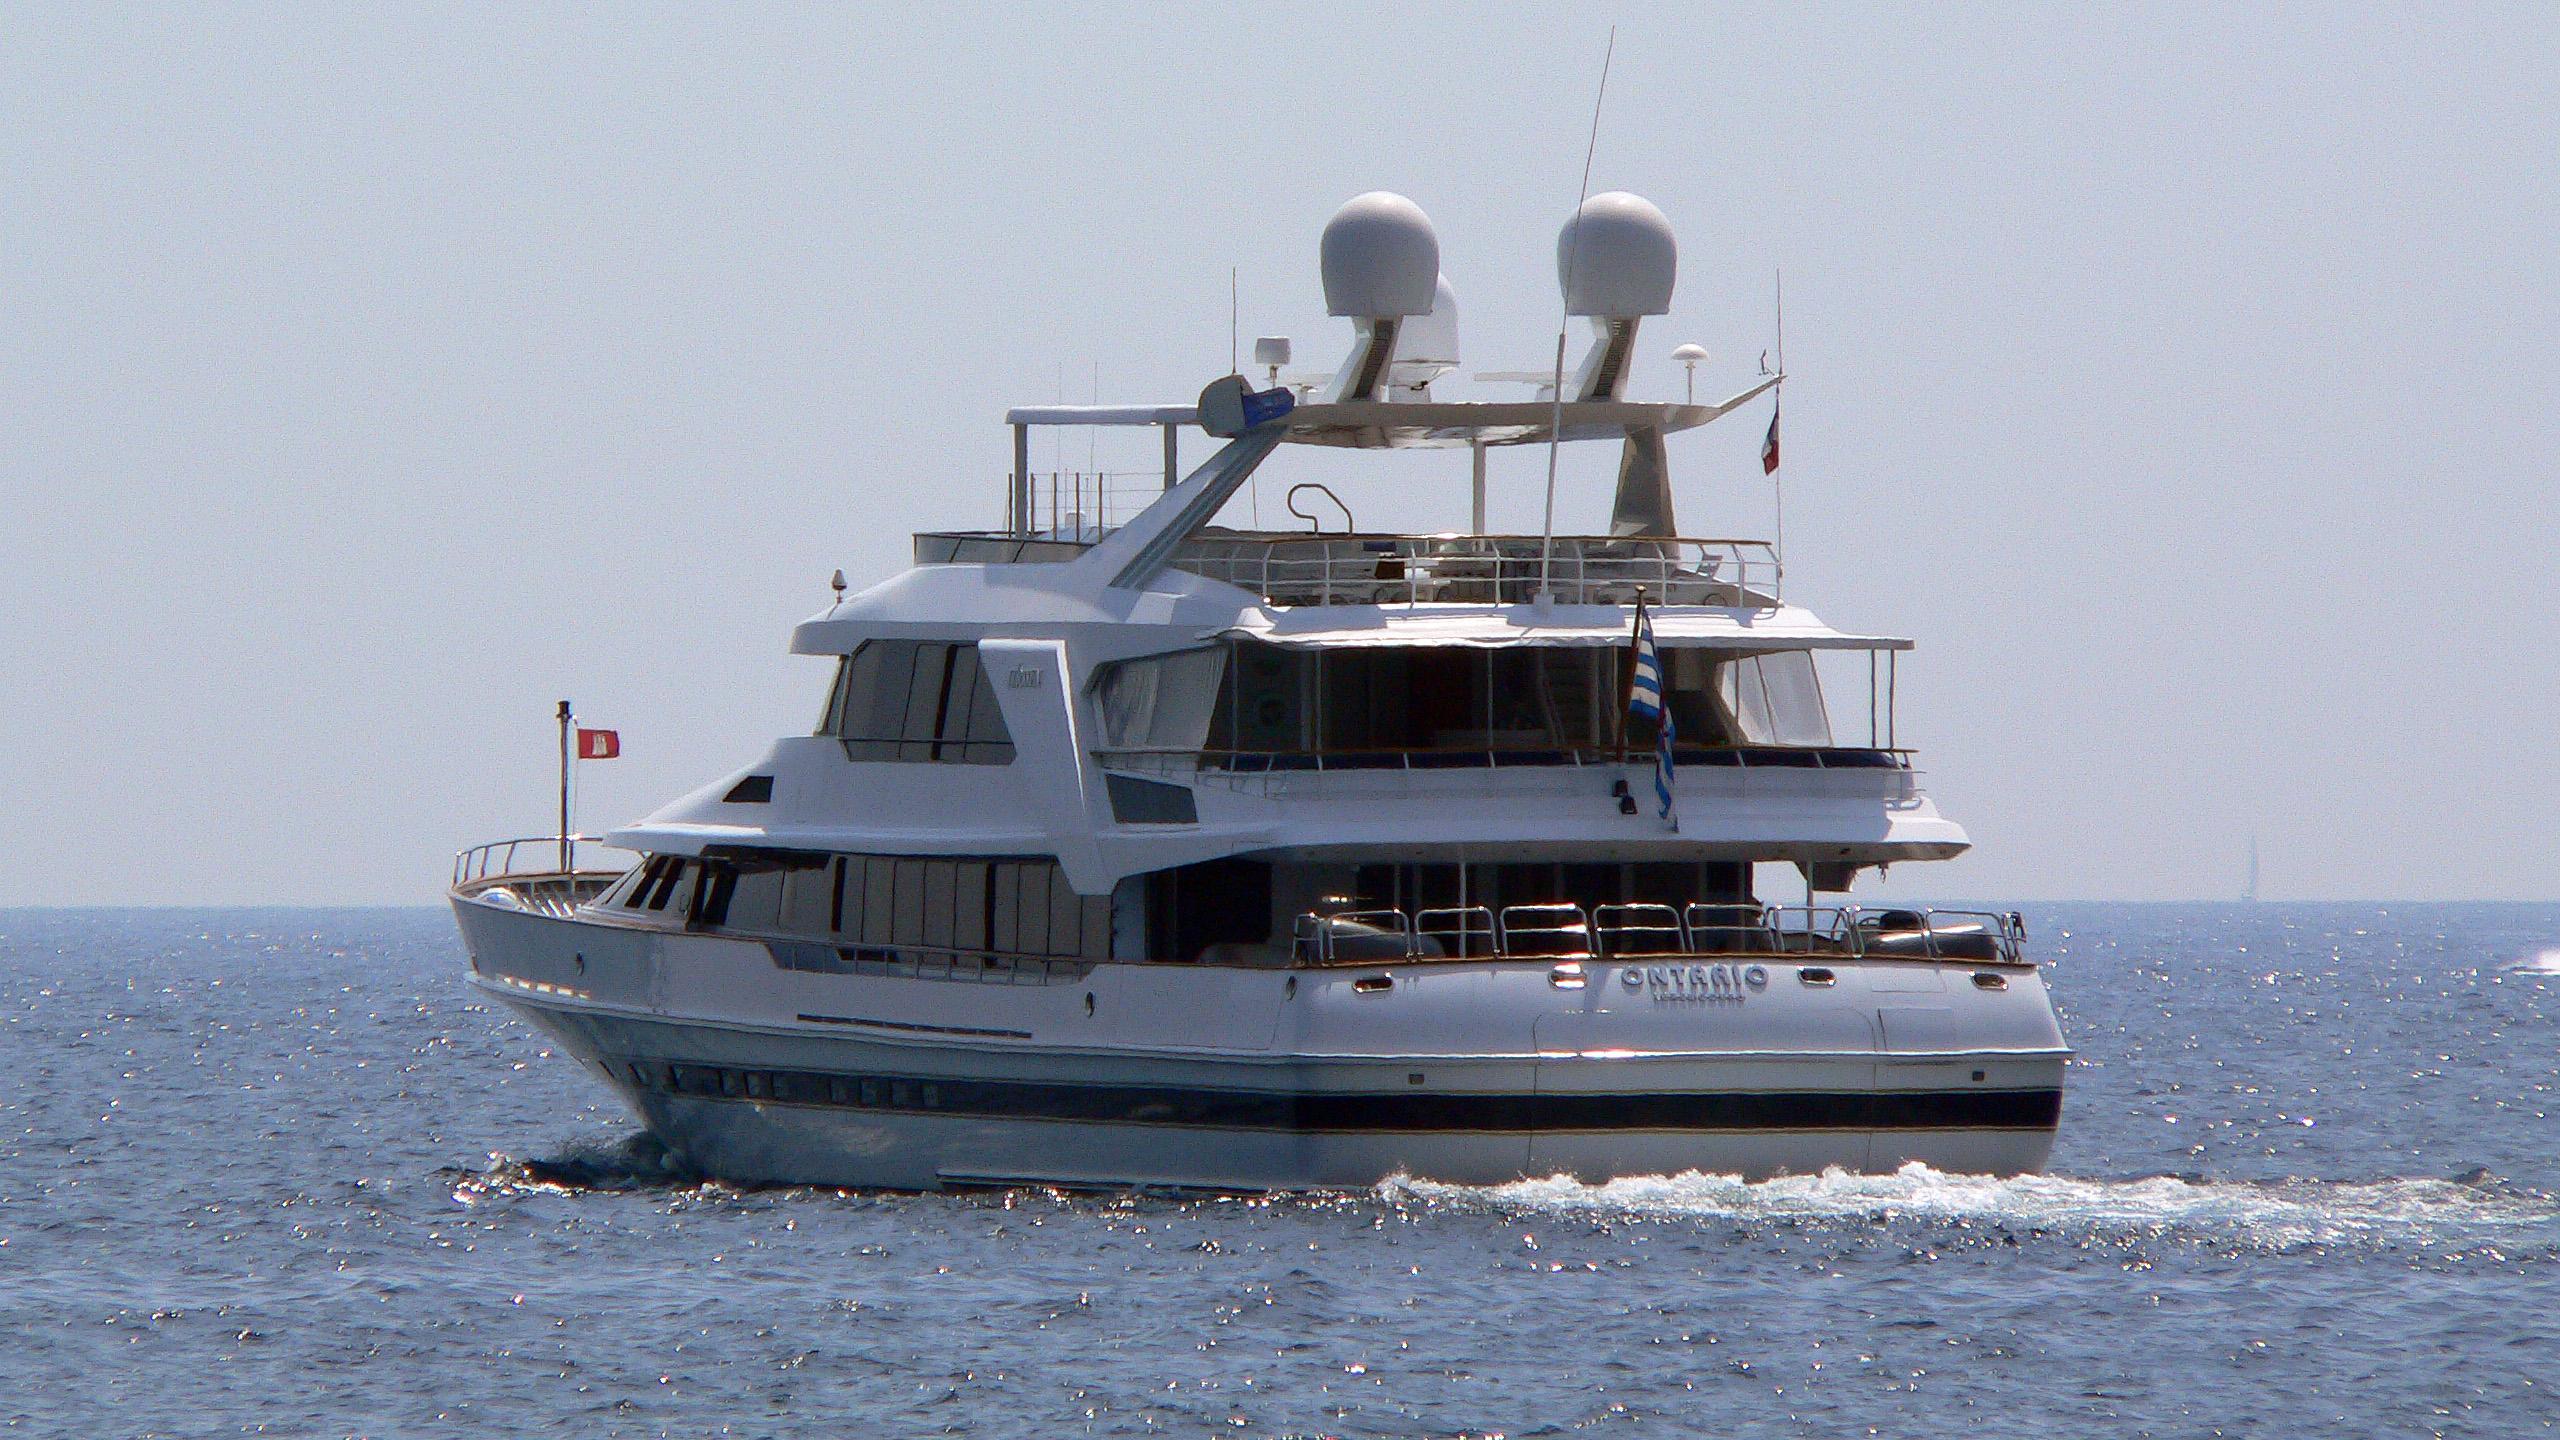 ontario-motor-yacht-lurssen-1992-46m-cruising-stern